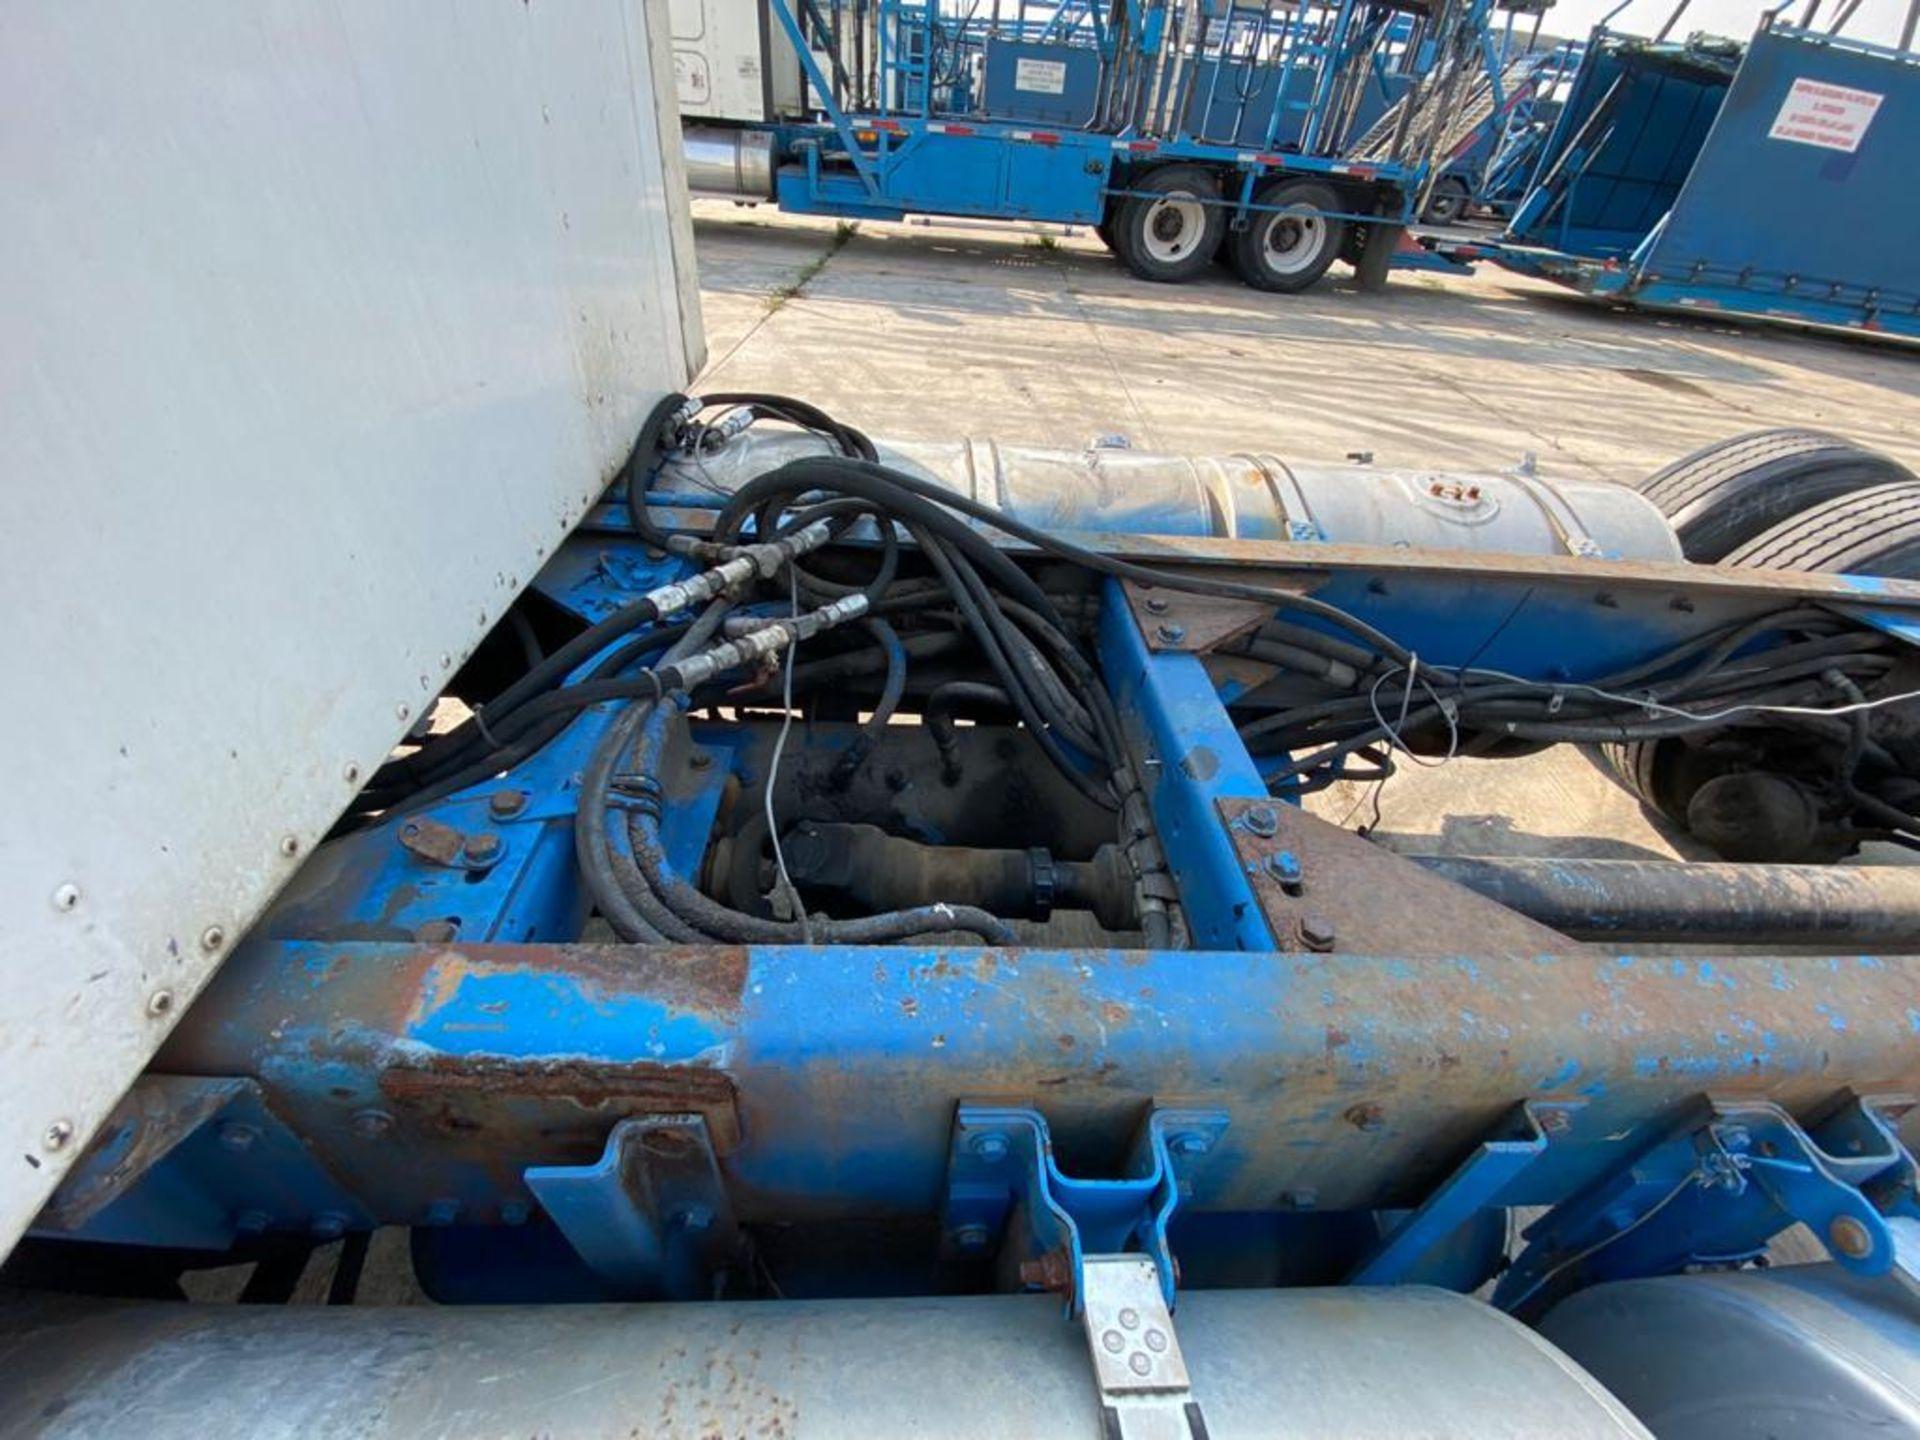 1998 Kenworth Sleeper truck tractor, standard transmission of 18 speeds - Image 13 of 75